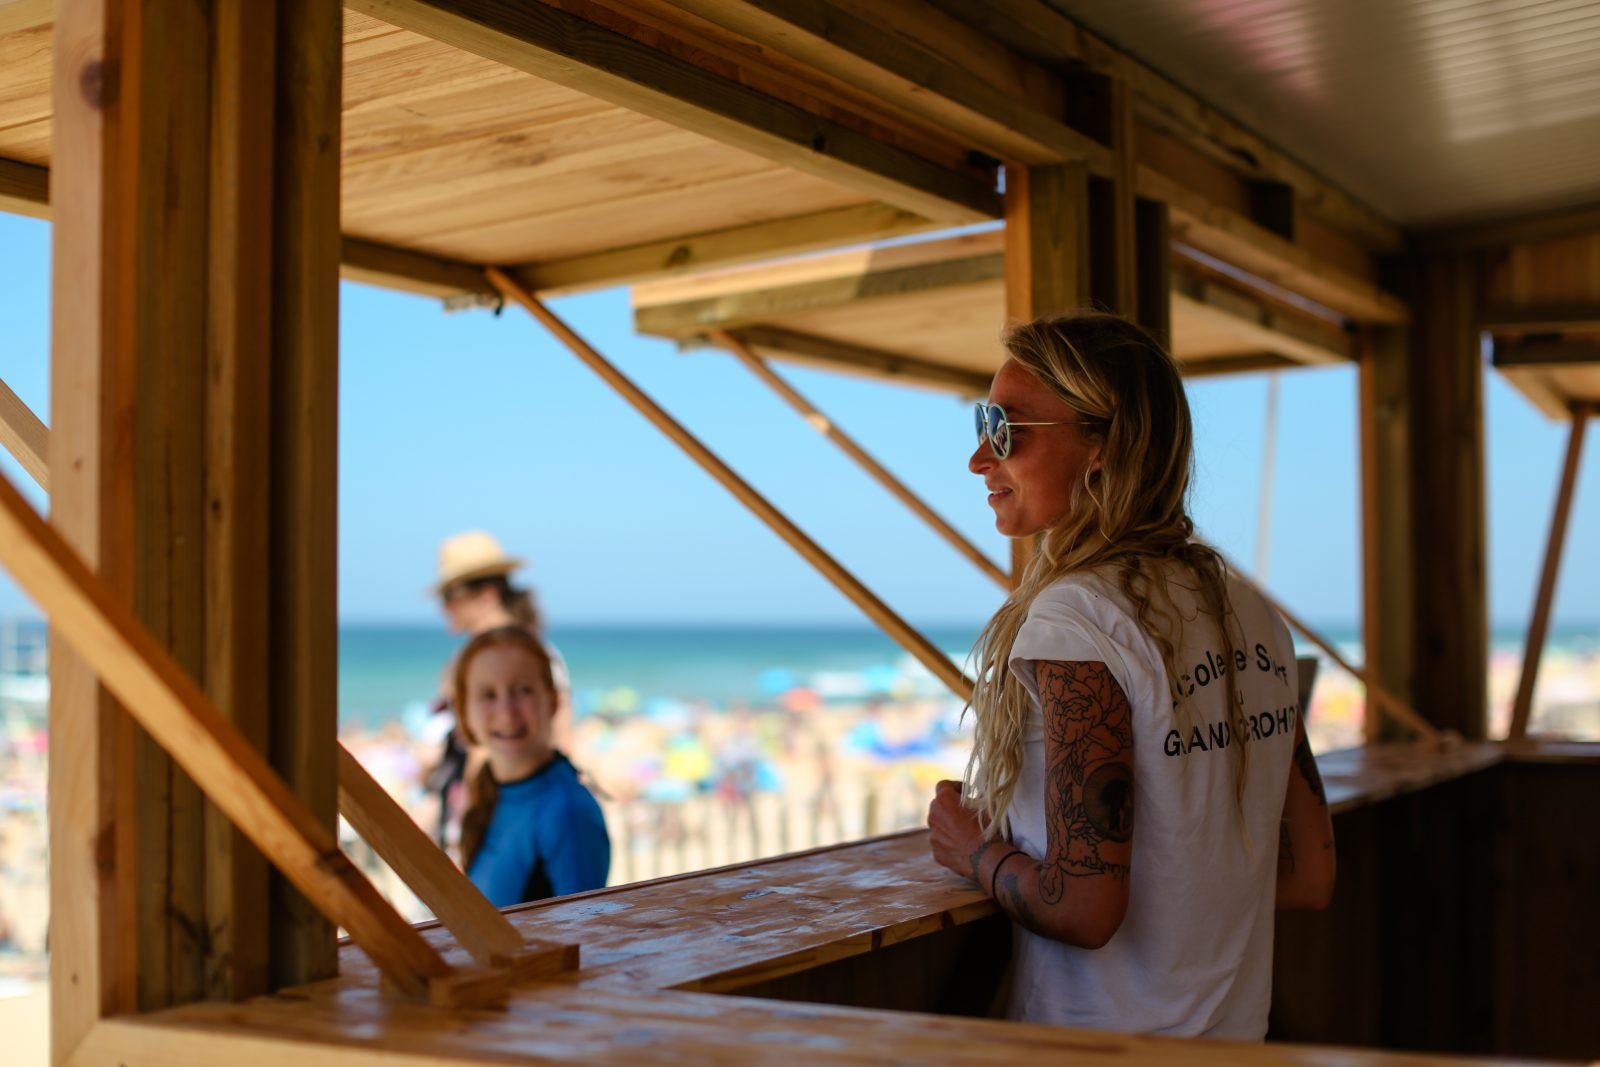 Ecole-surf-grand-crohot–10-